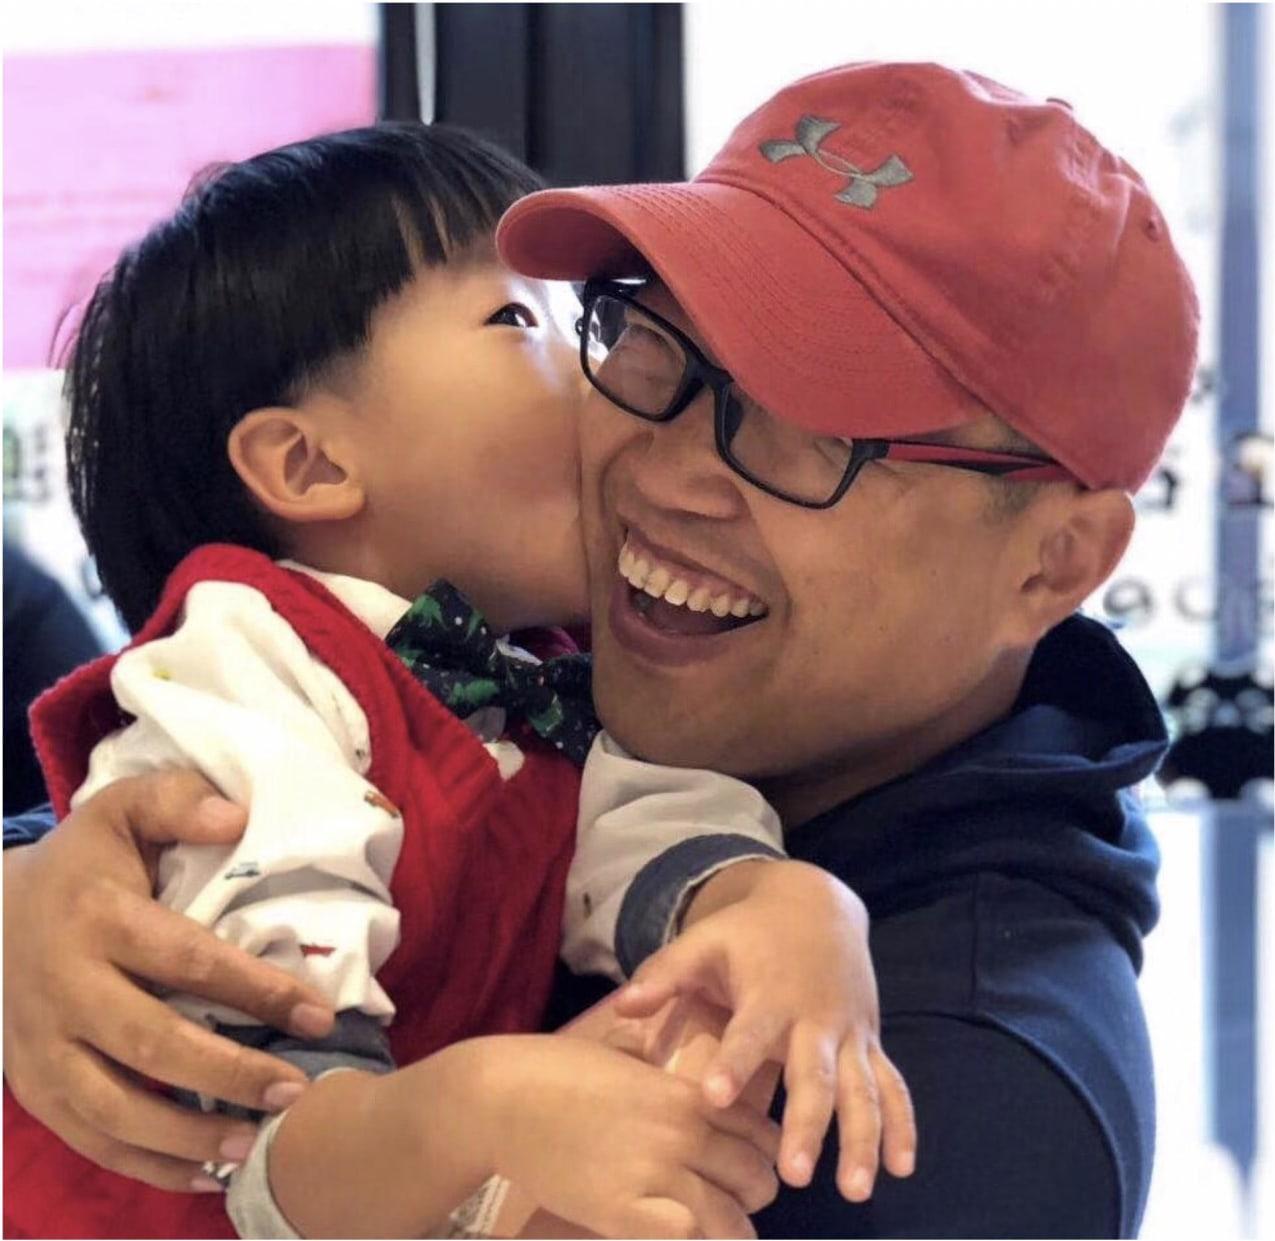 A little boy kisses his father